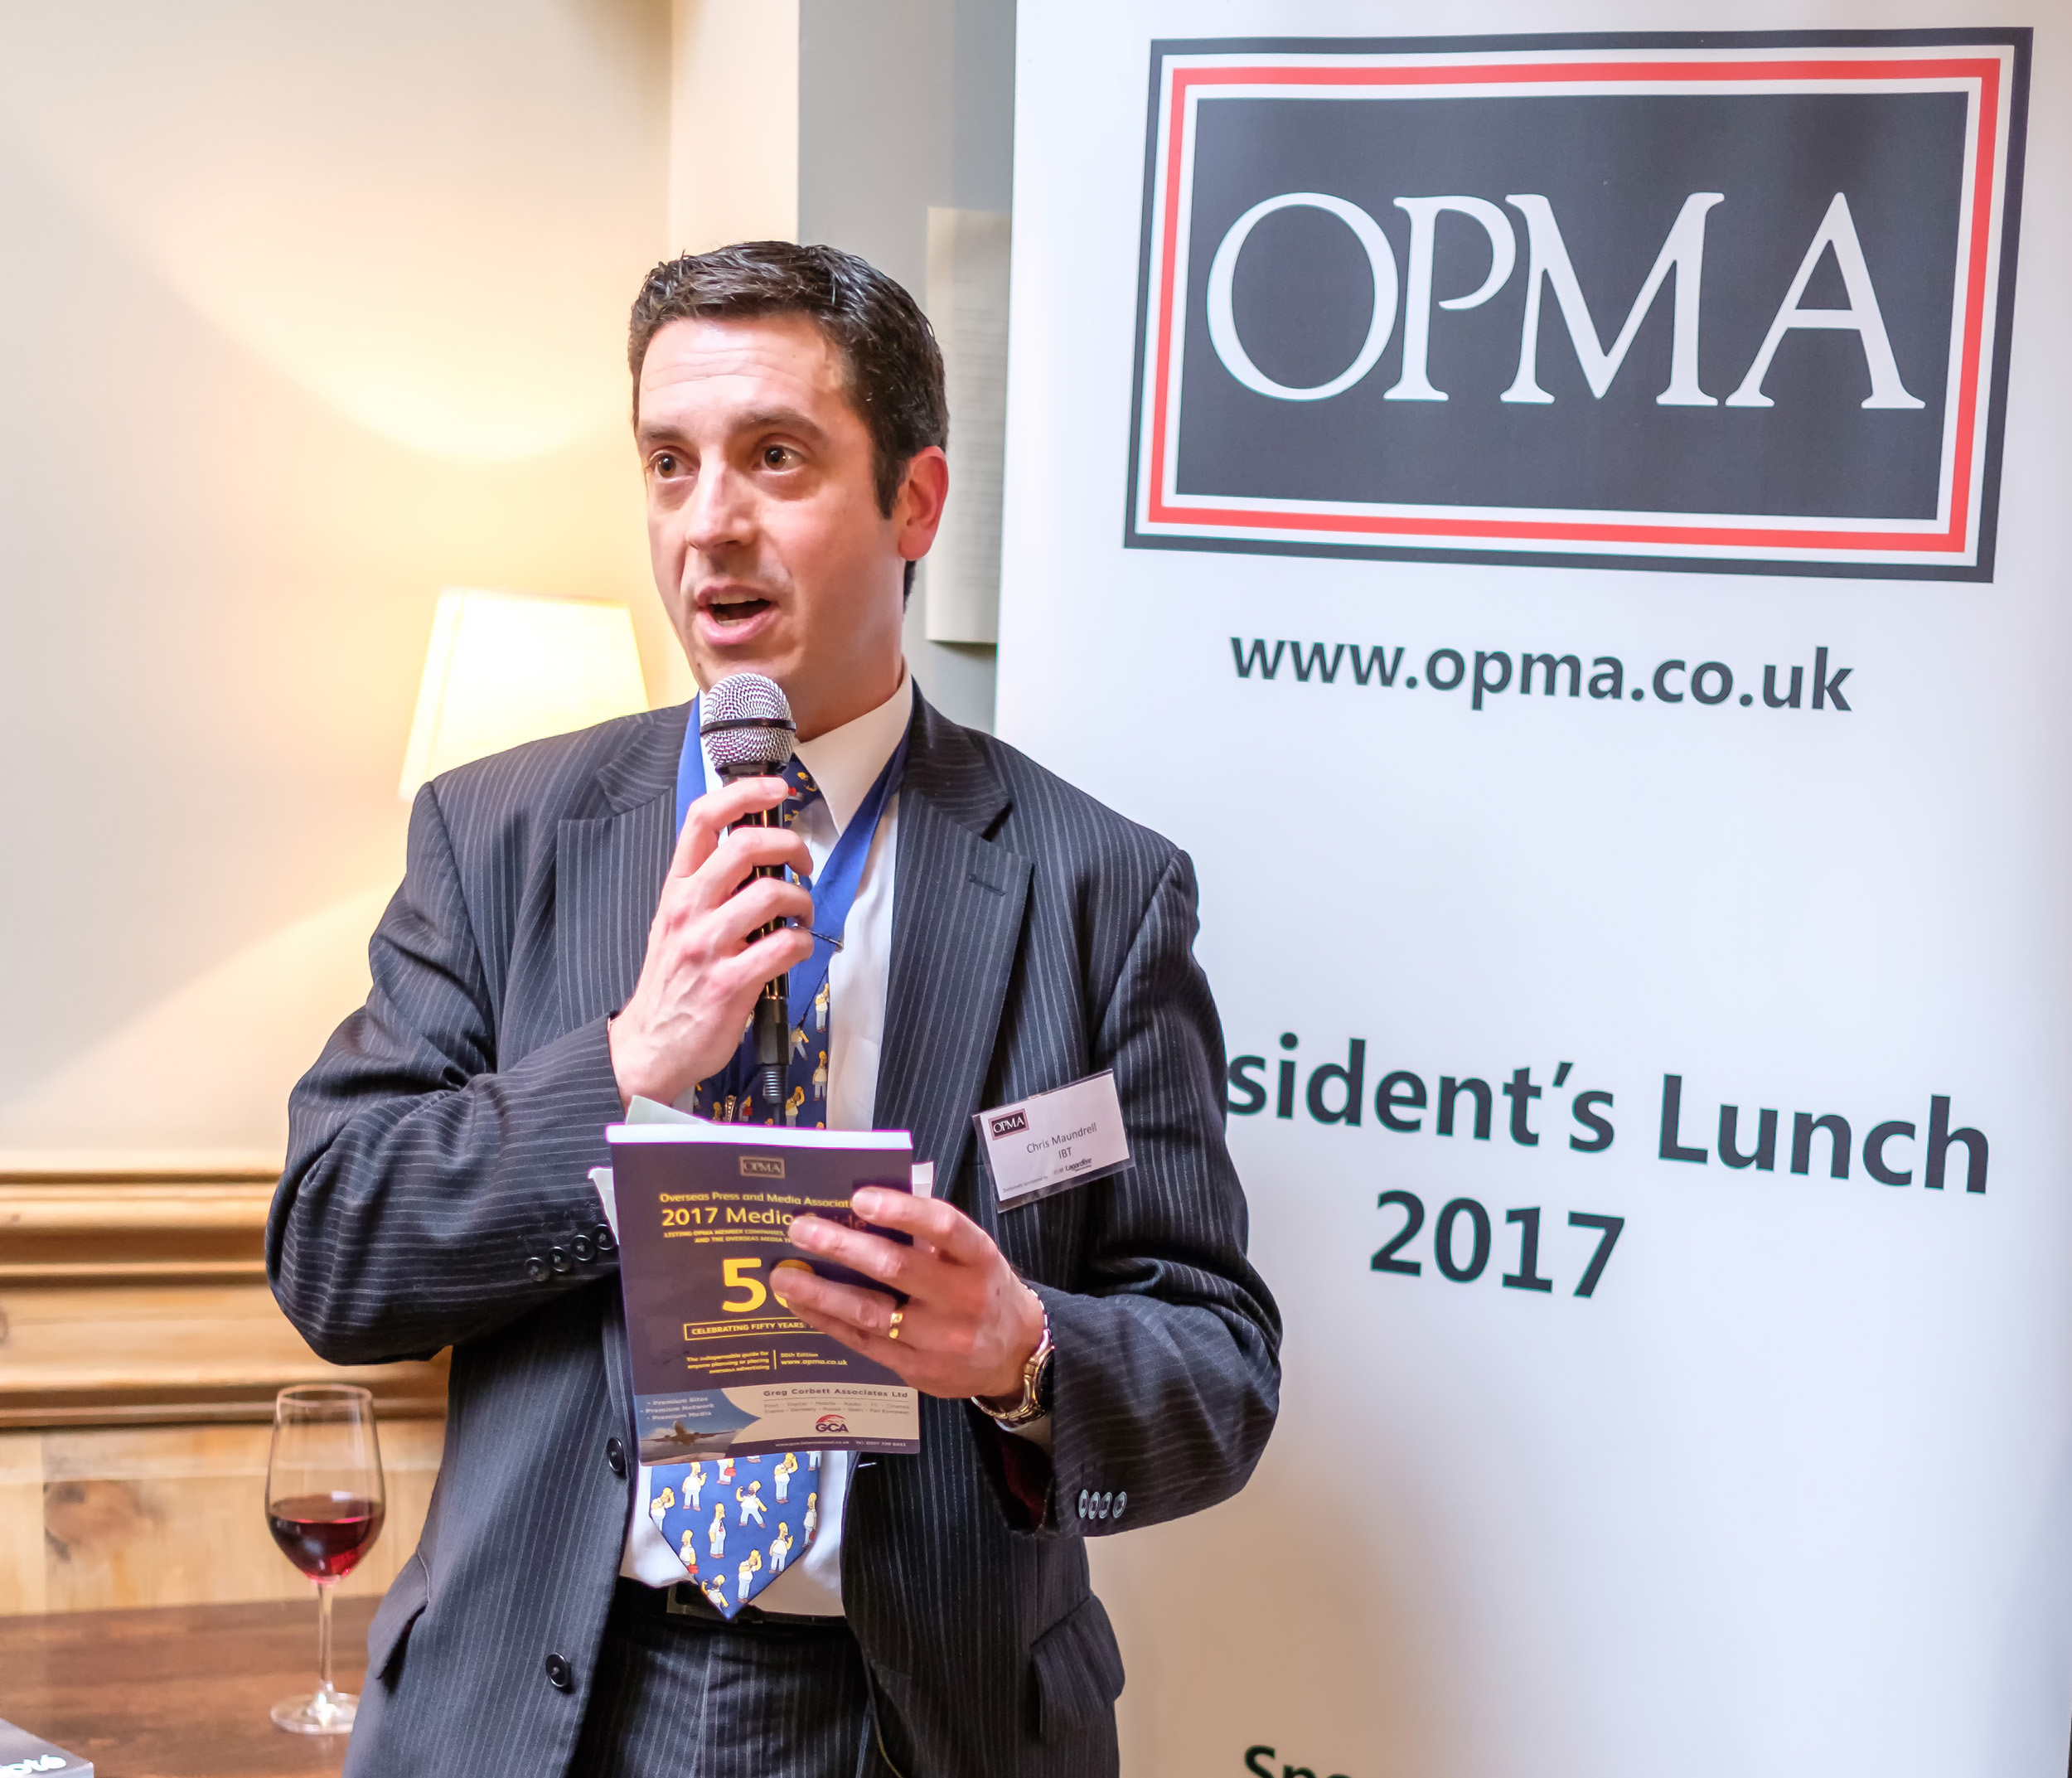 OPMA Presidents Lunch 17.jpg